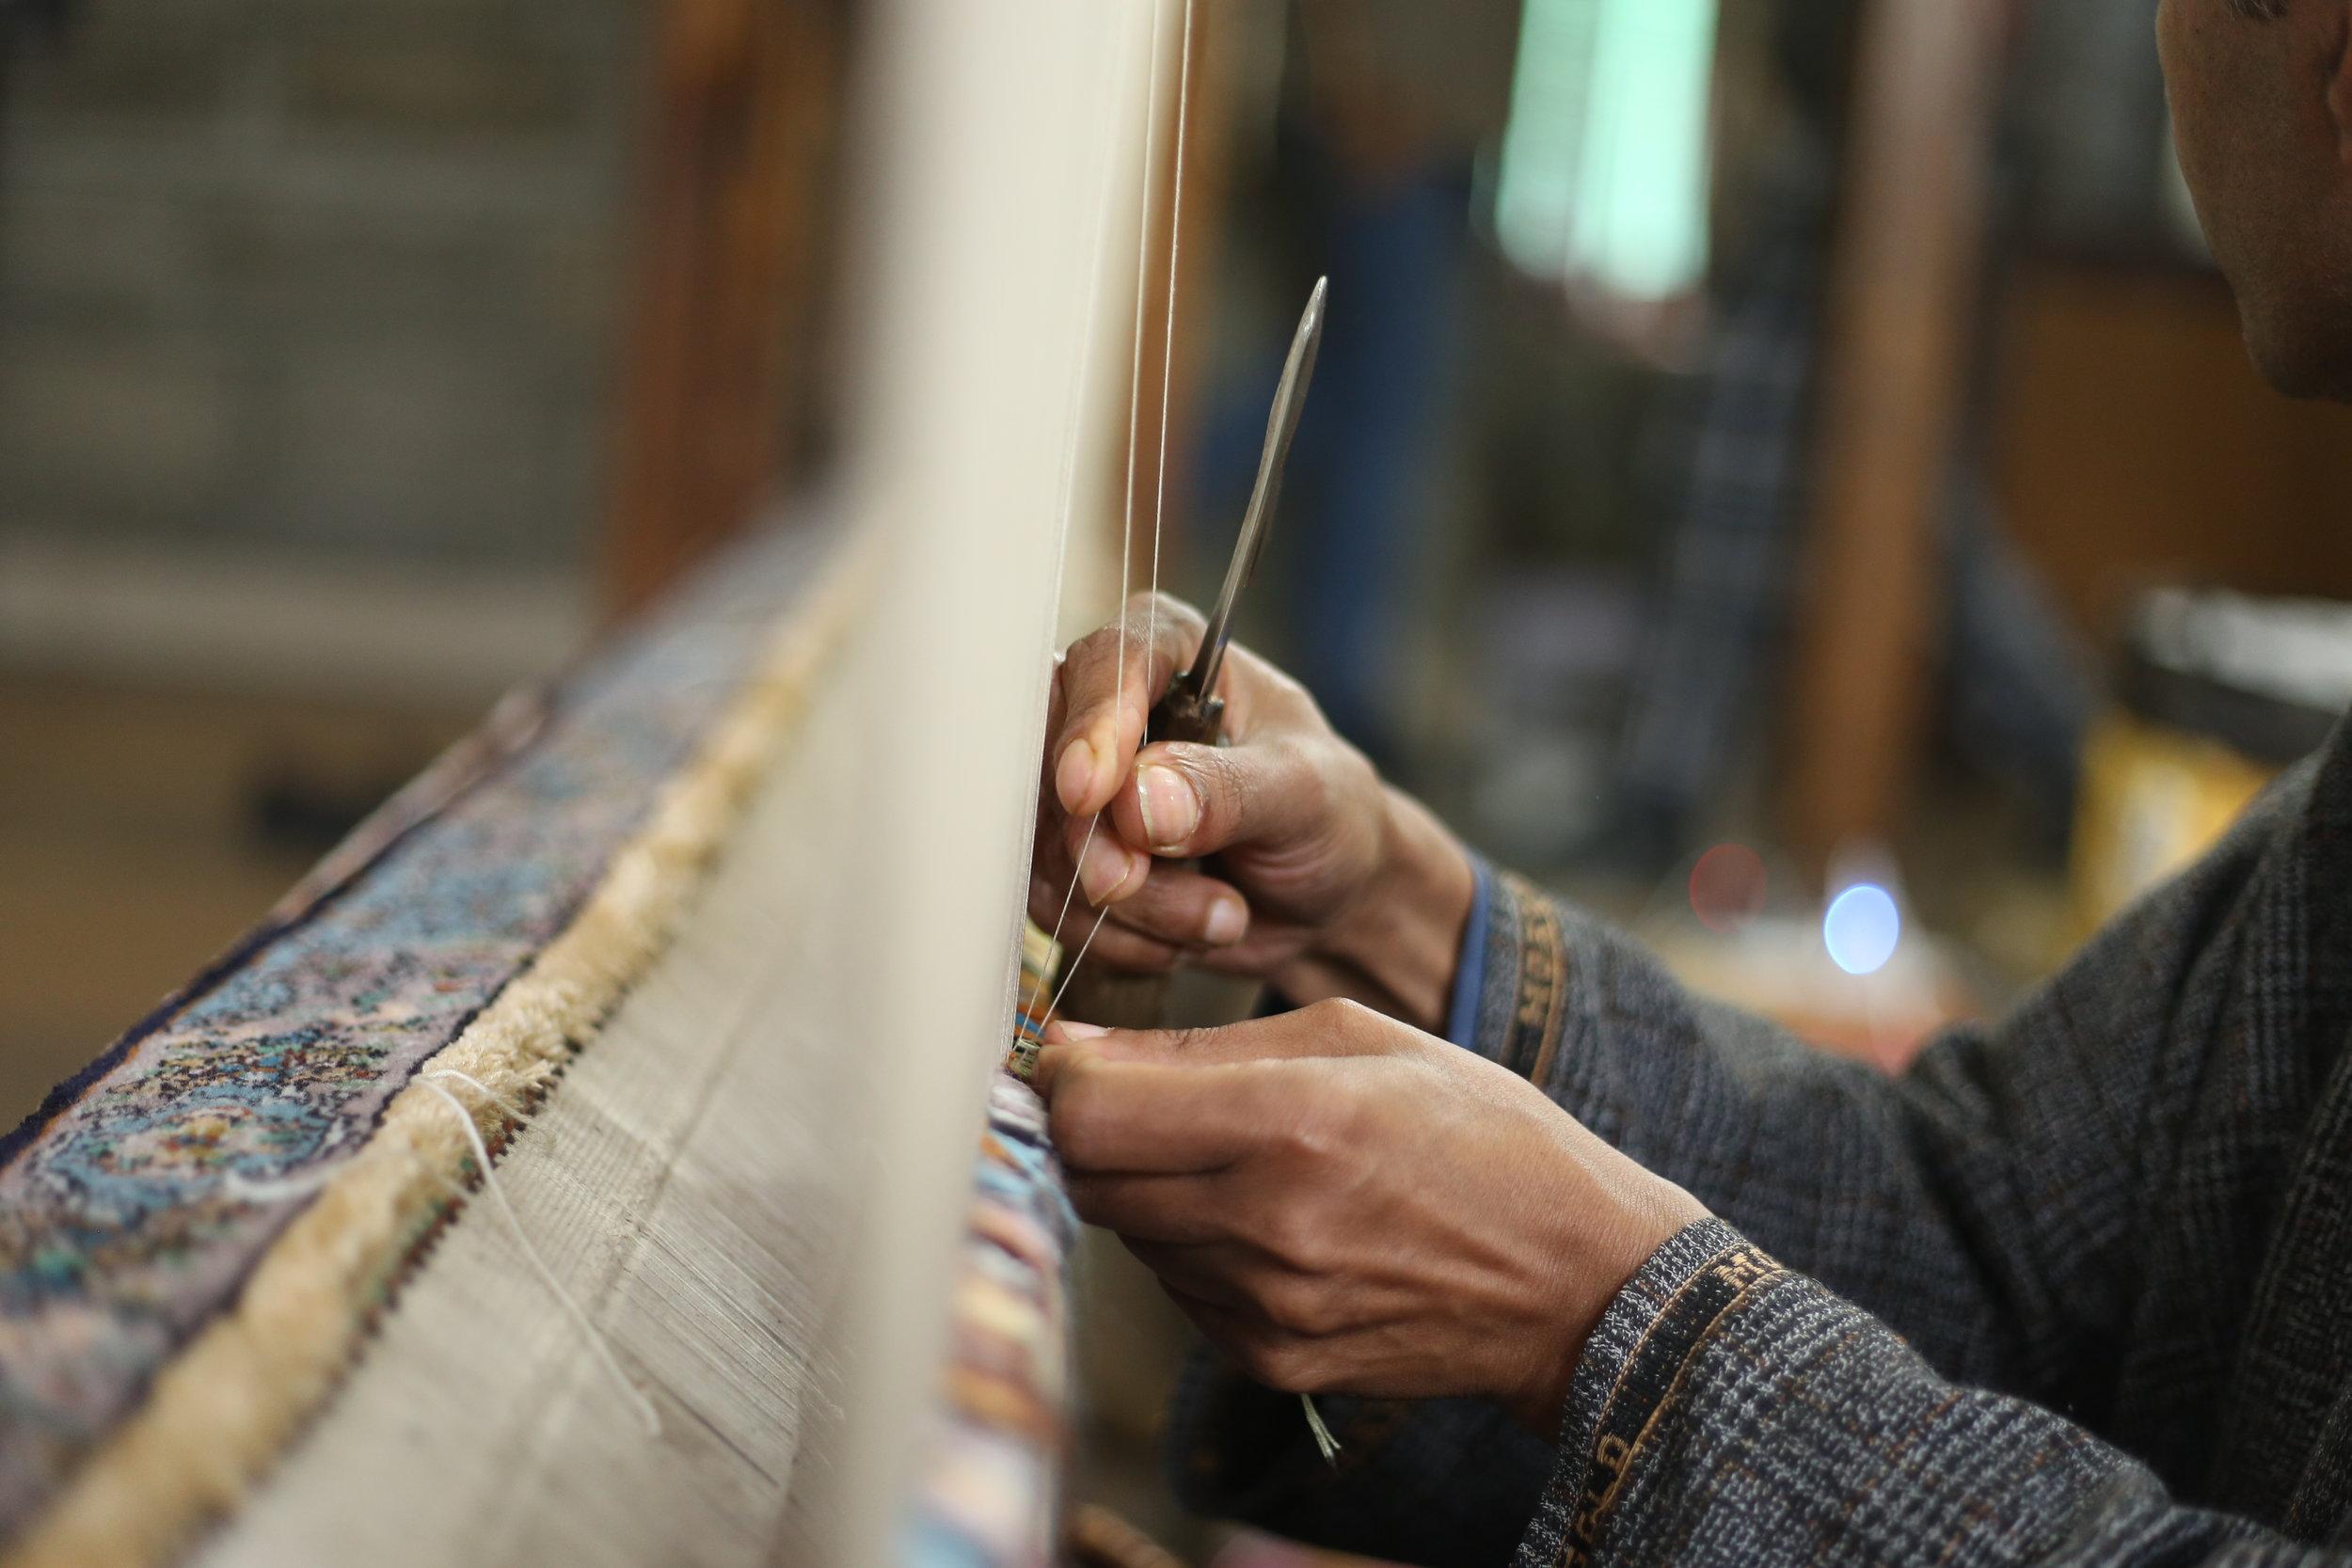 Hands at work, making a Kashmiri Carpet